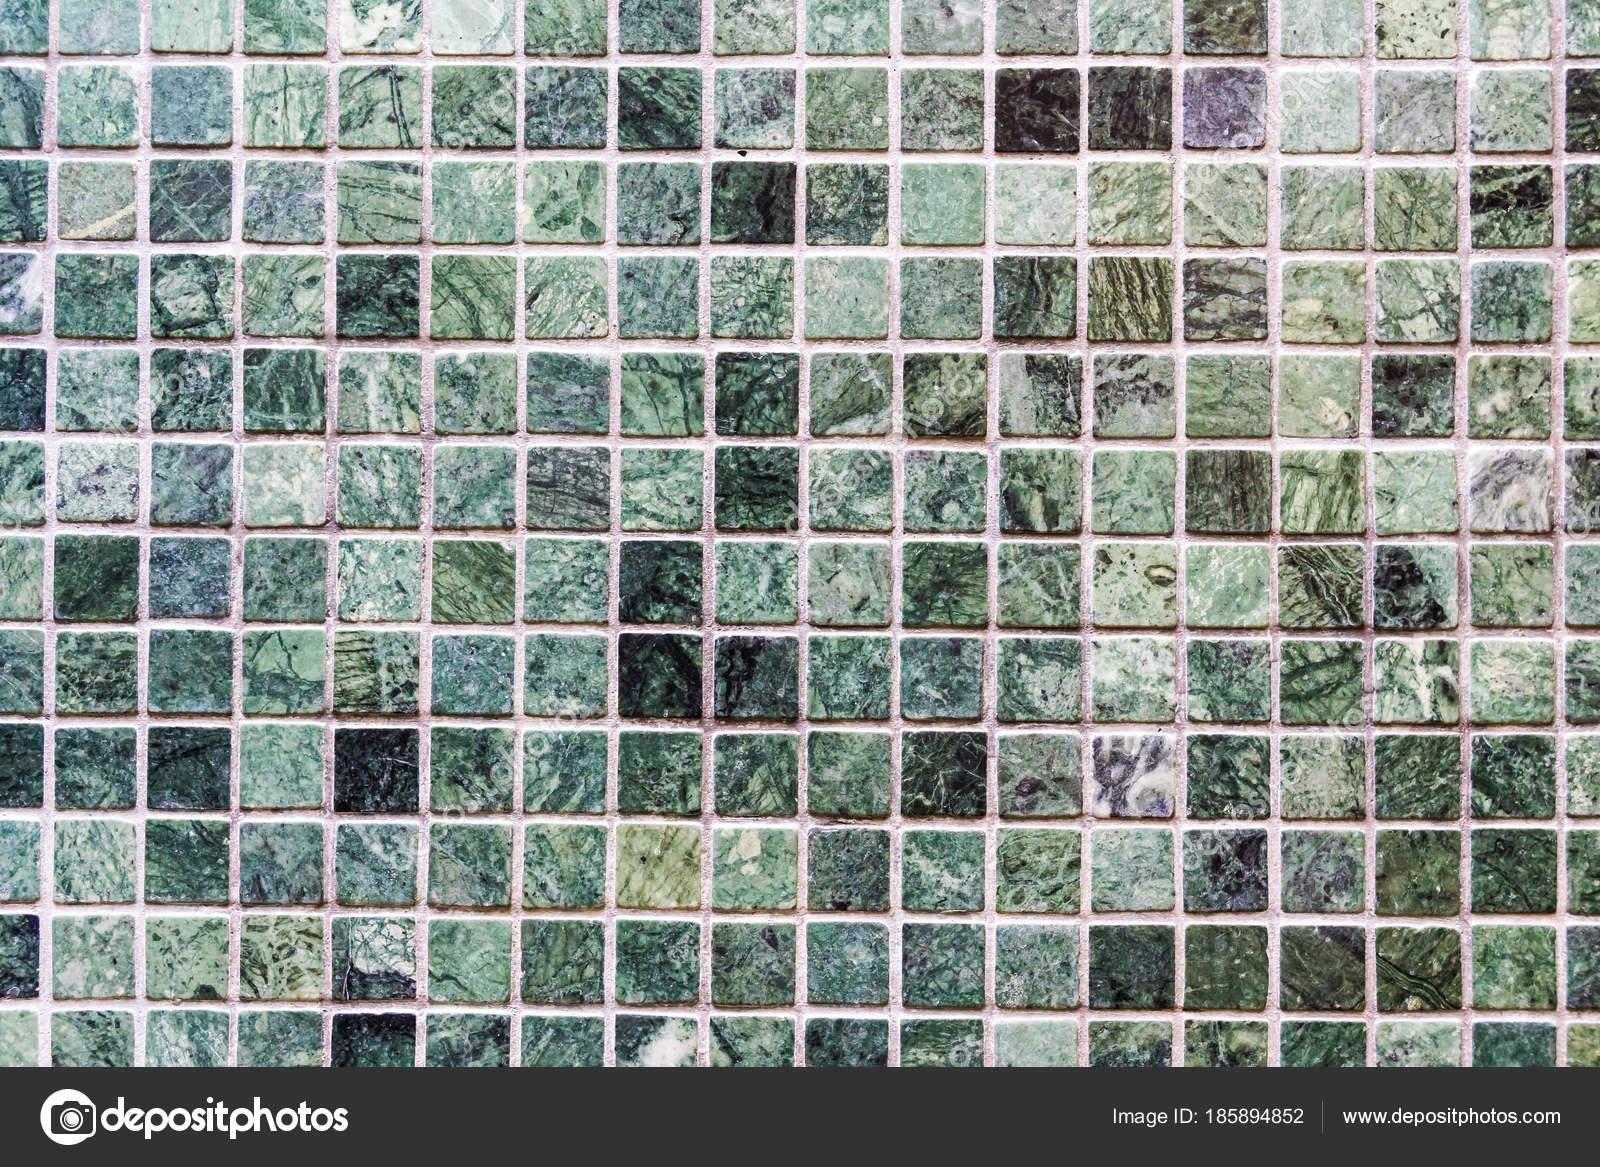 Groene Wandtegels Keuken : Groene tegels muur texturen en oppervlak u stockfoto mrsiraphol